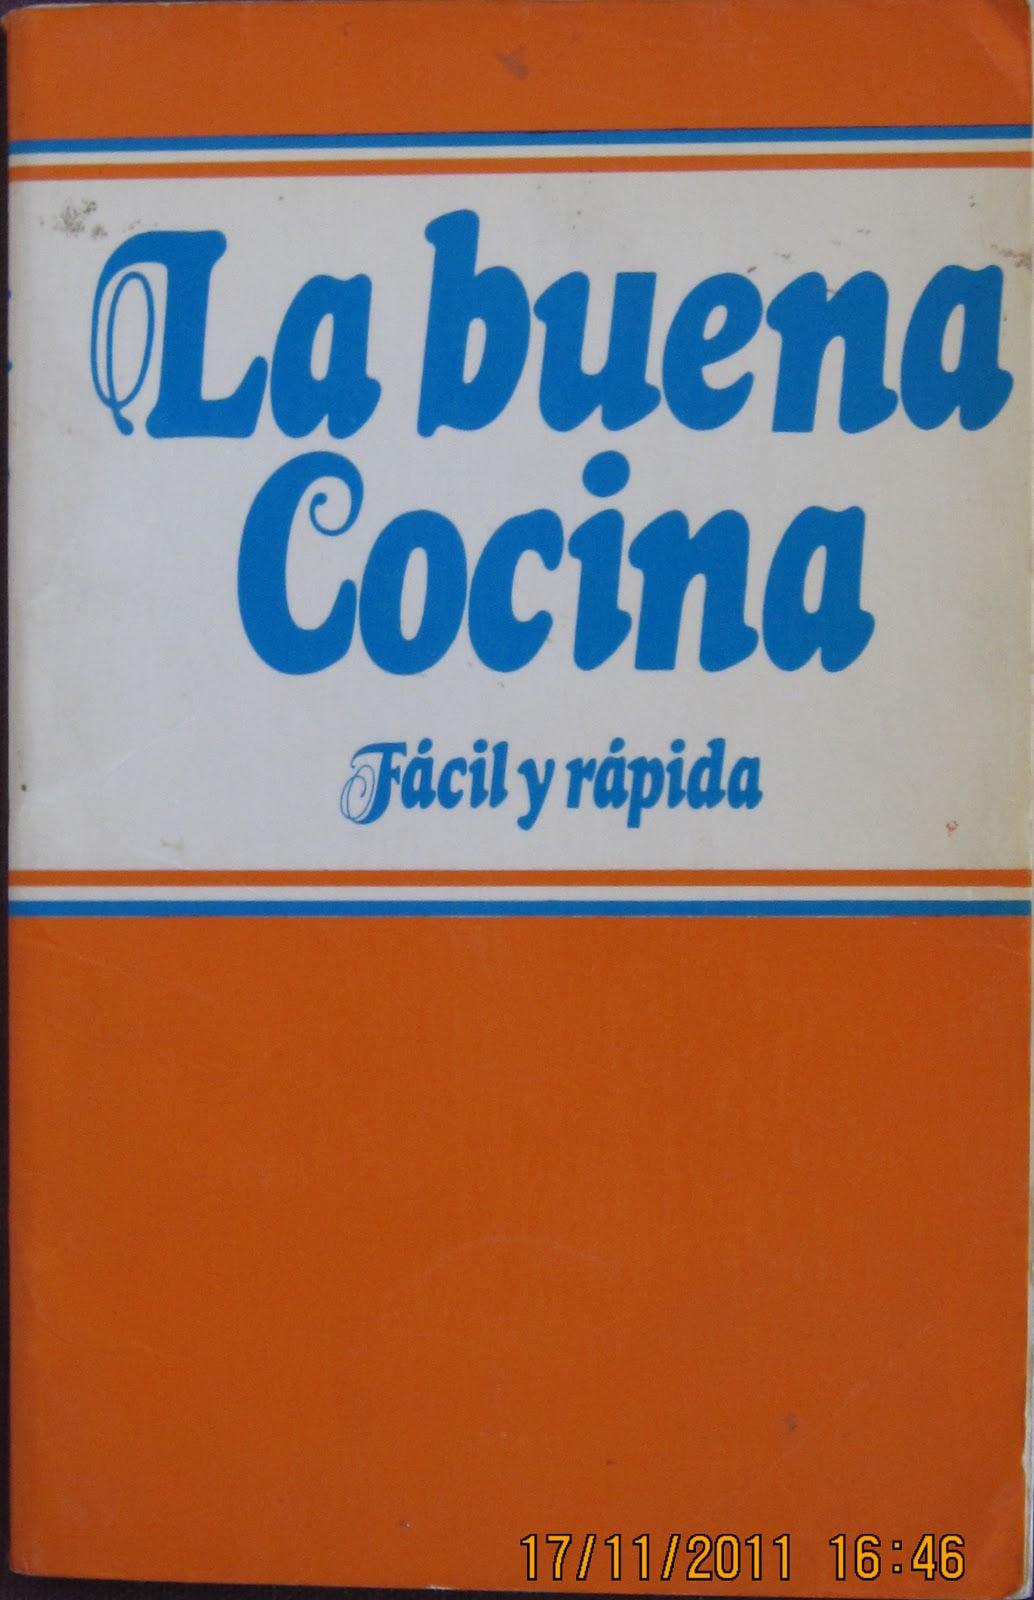 mis libros ya leidos cocina